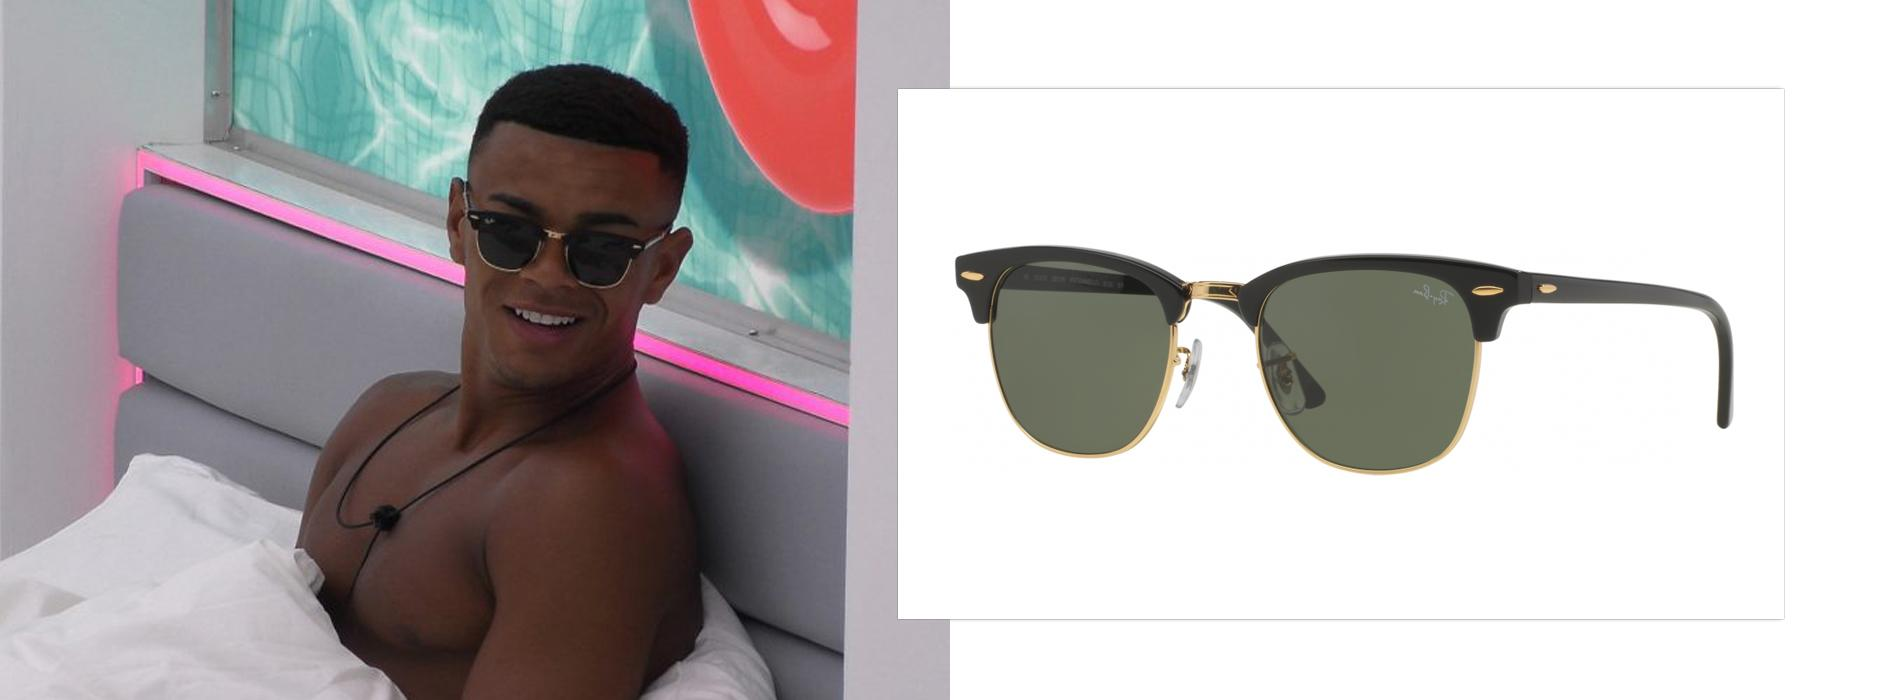 98c279ee4e ... coupon ray ban clubmaster rb3016 w0365 49 sunglasses 127.00 89.72 8fa1e  bf667